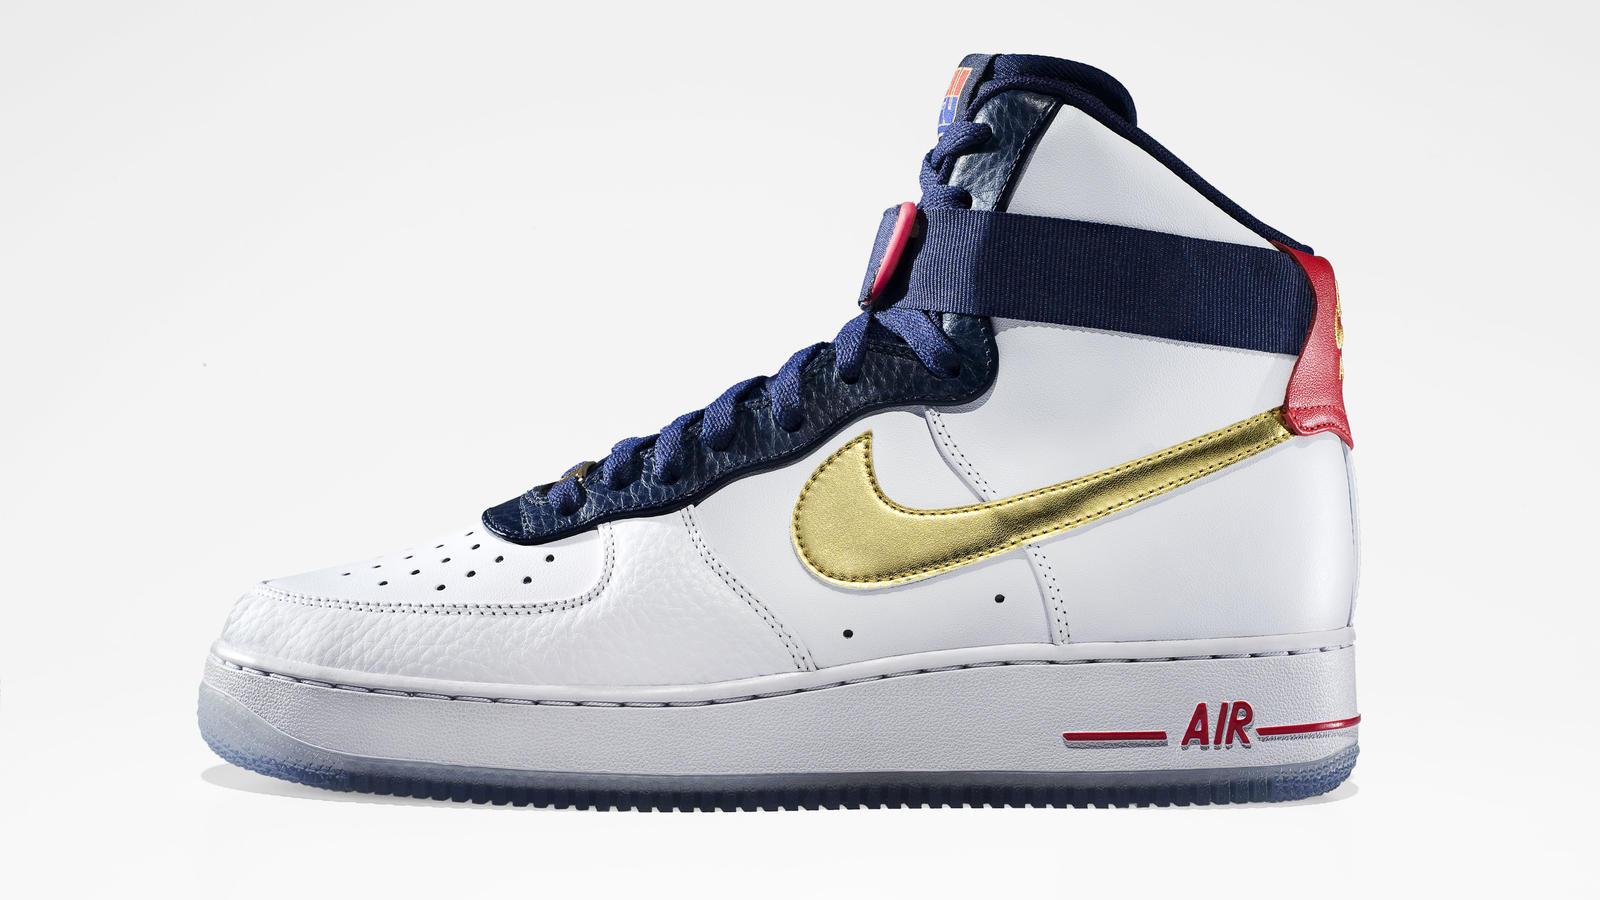 Homage Pays Sportswear Dream Team News Basketball's Nike To dQthsr